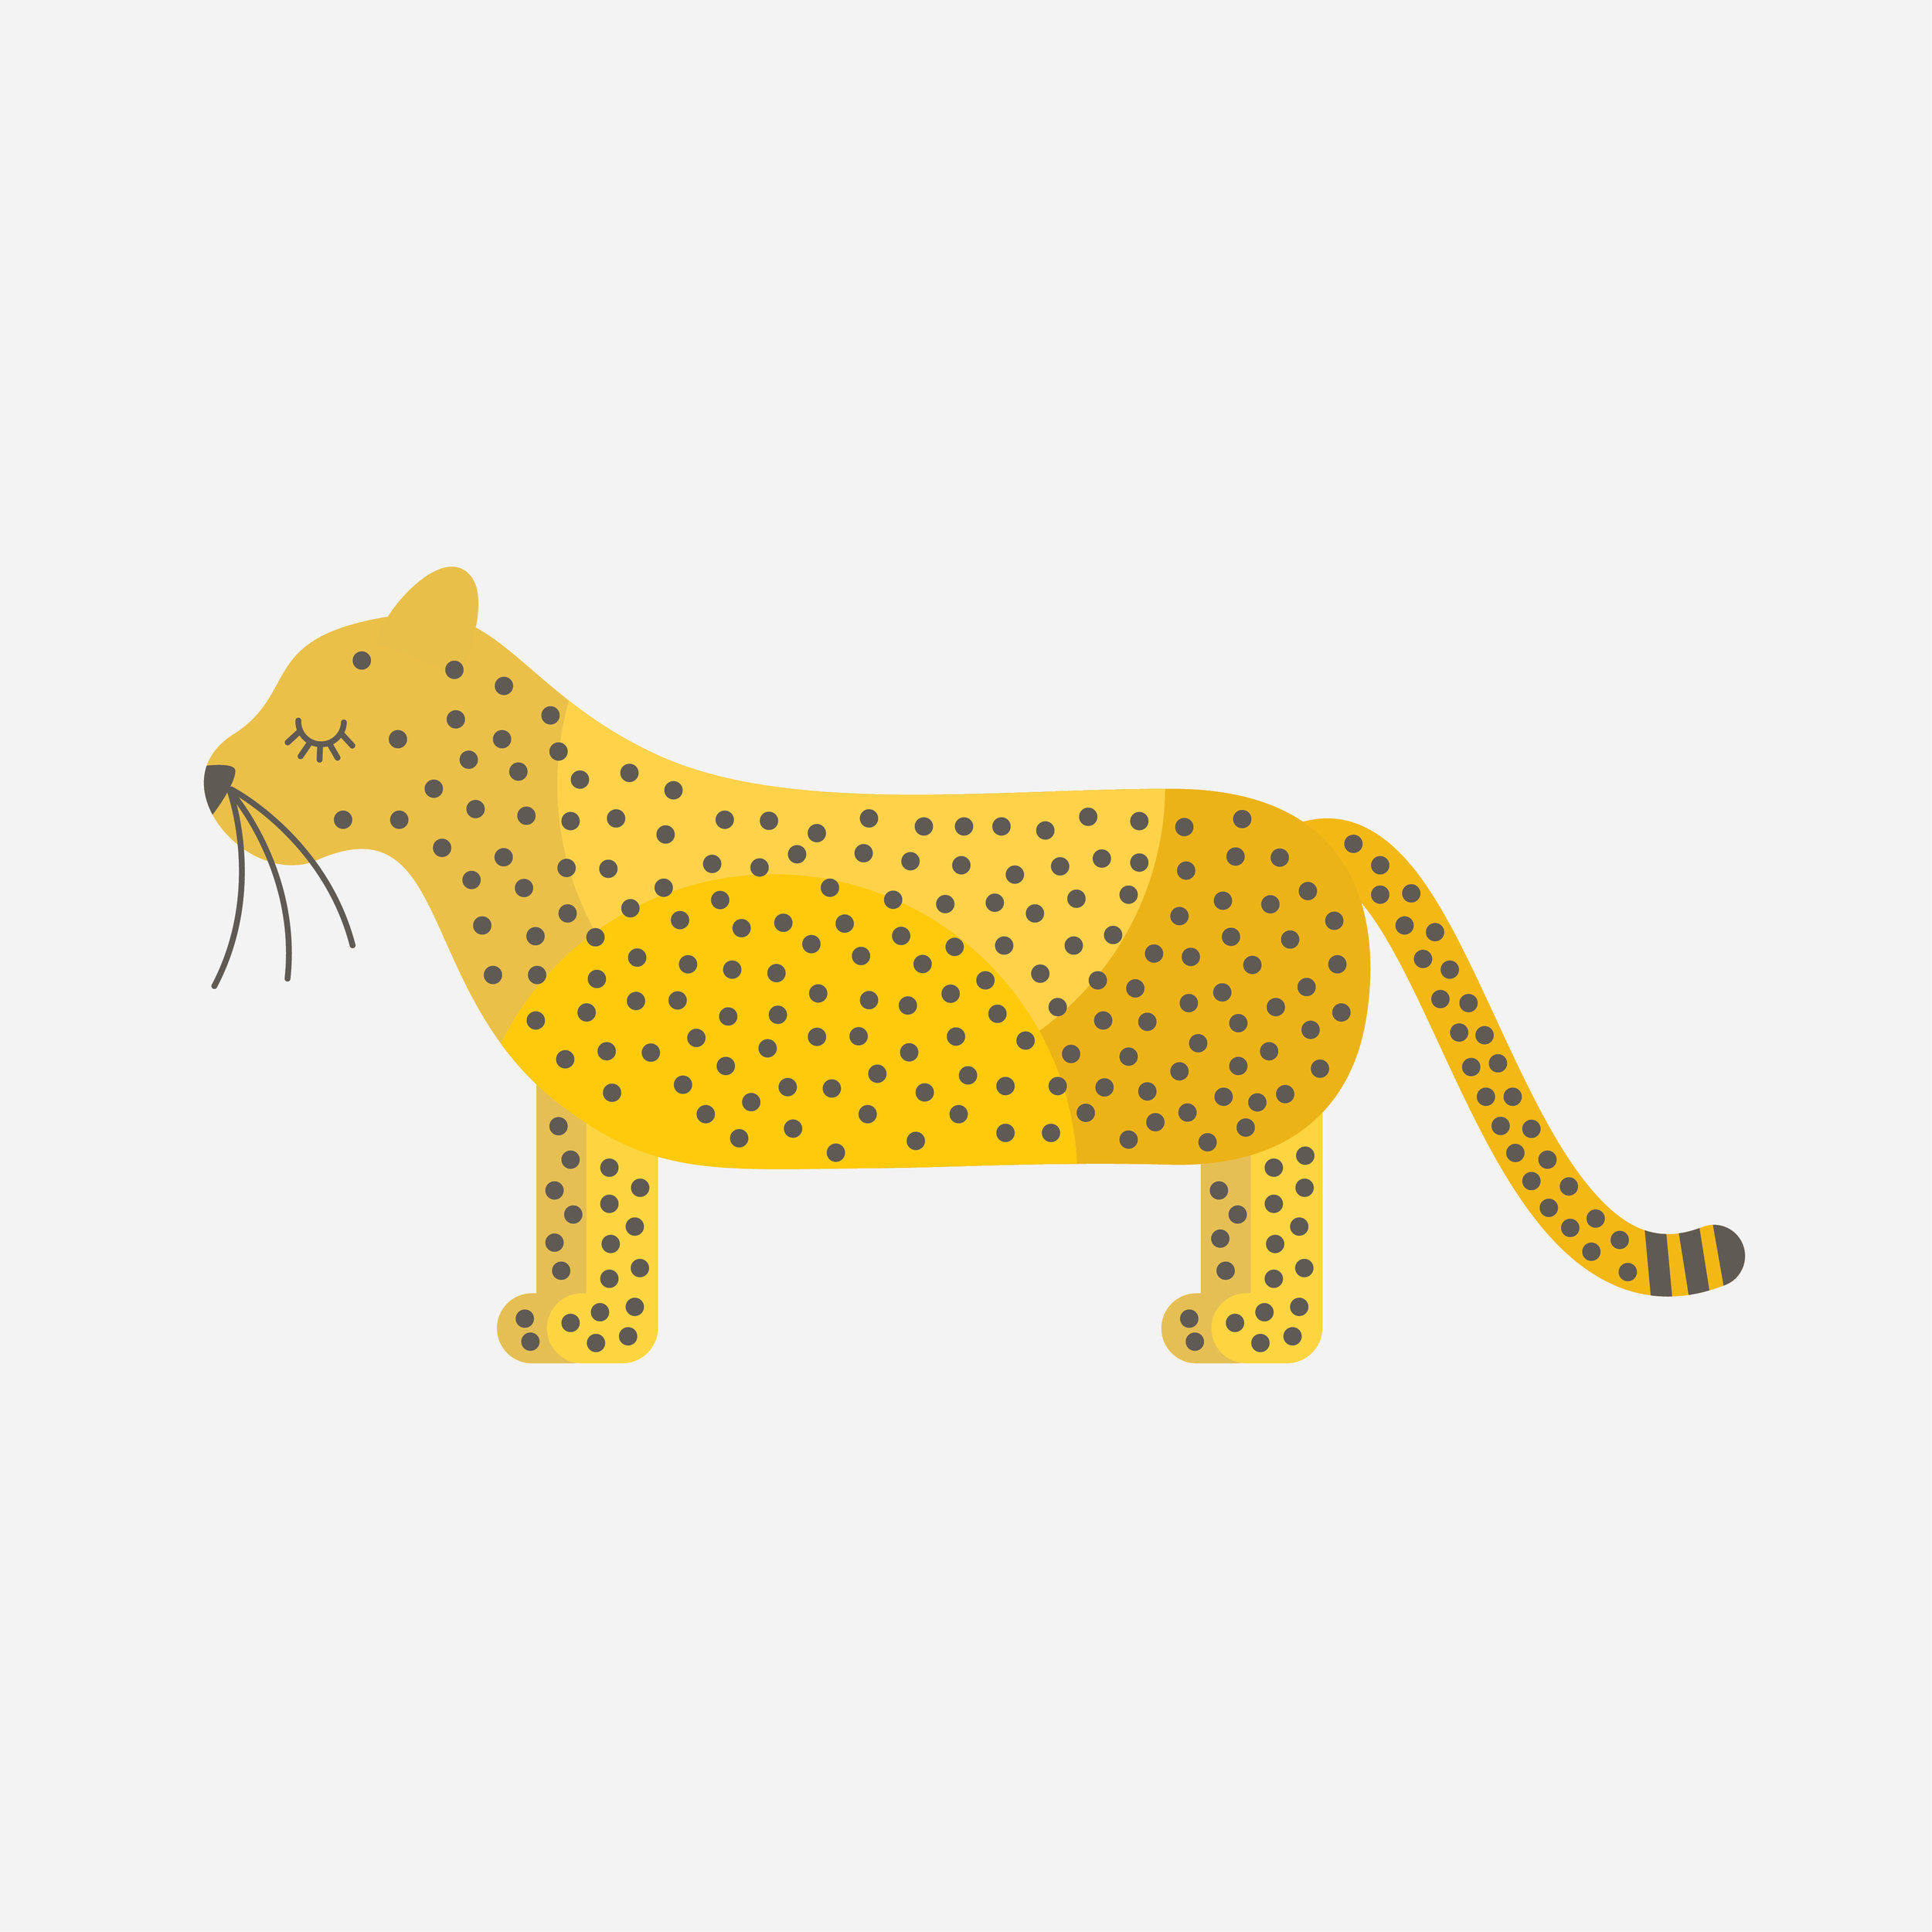 cheetah-85.jpg